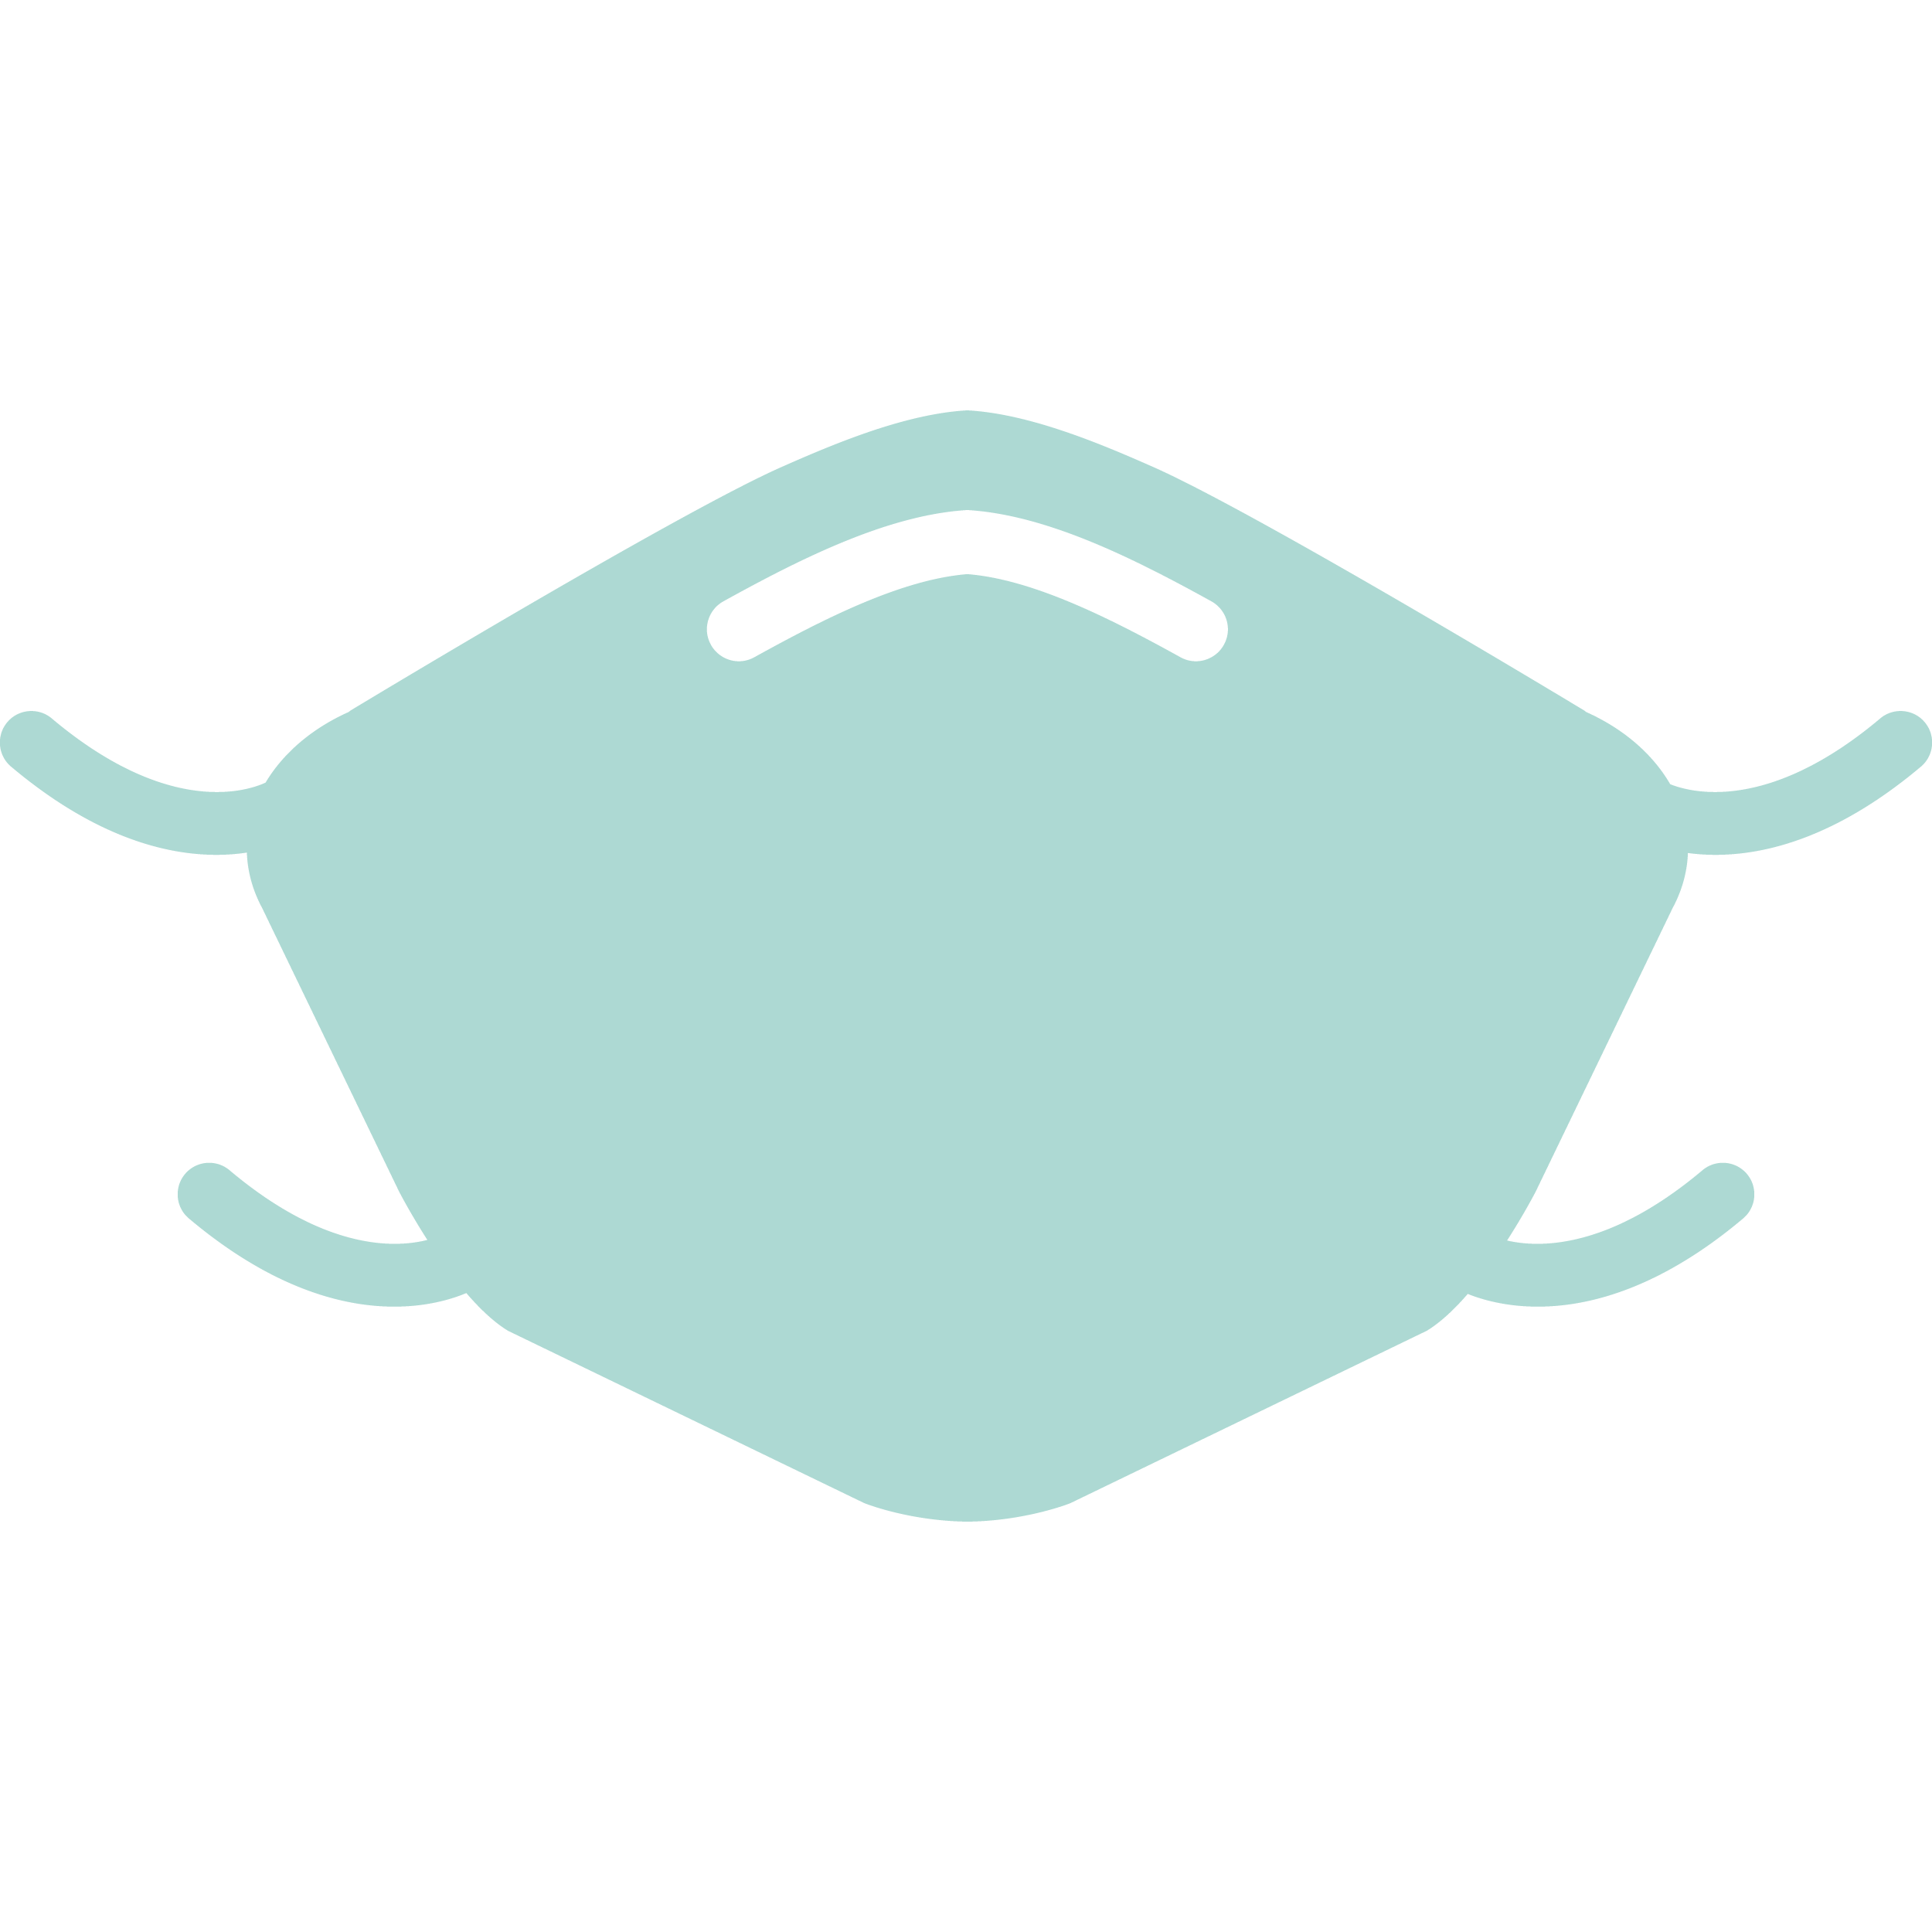 Coronavirus Disease Face Mask Free DXF File